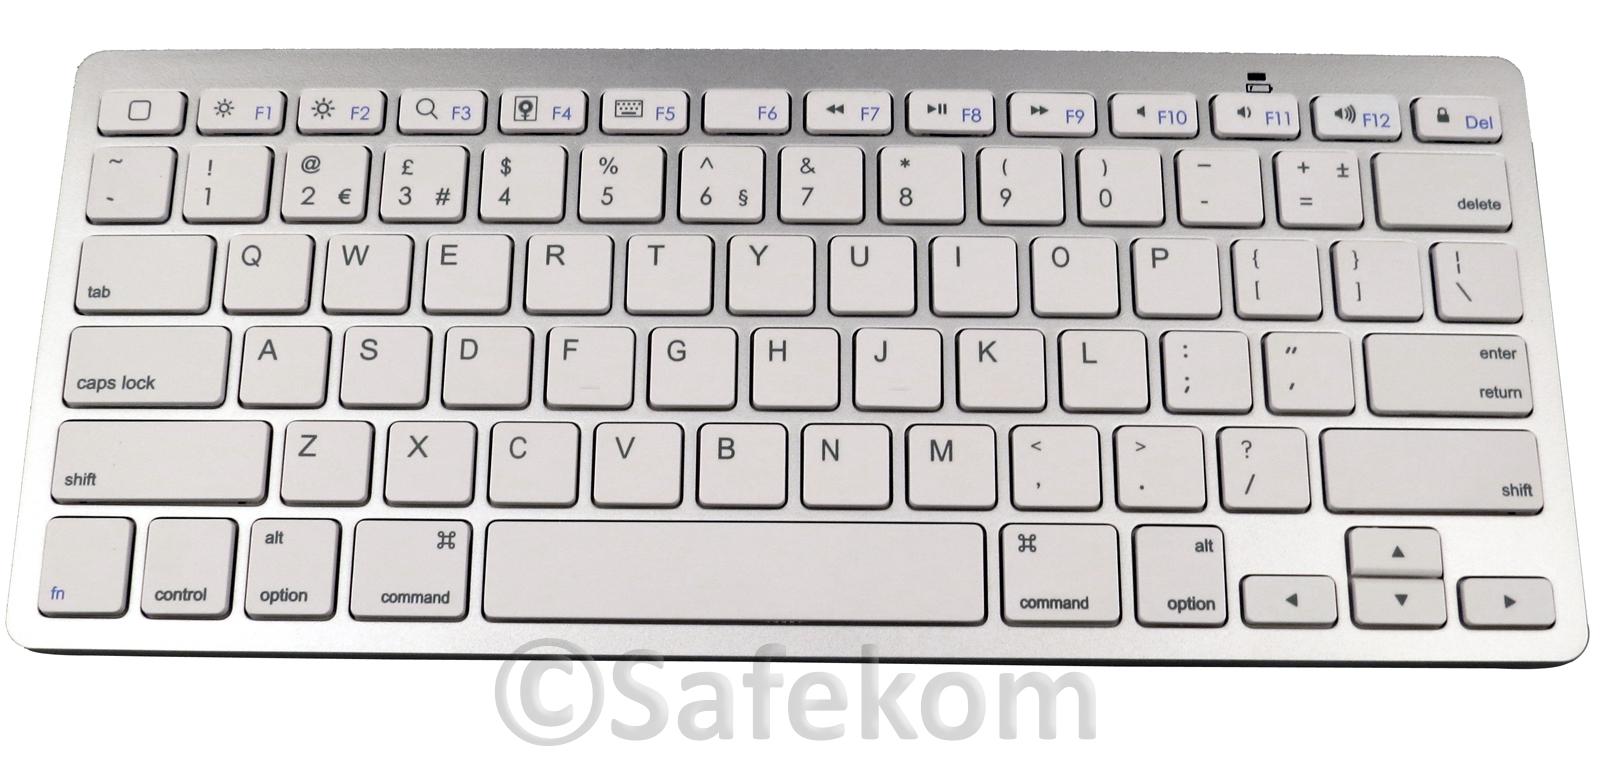 Wireless-Bluetooth-Keyboard-Cover-Case-Dock-Stand-Apple-iPhone-iPad-2-3-4-Galaxy